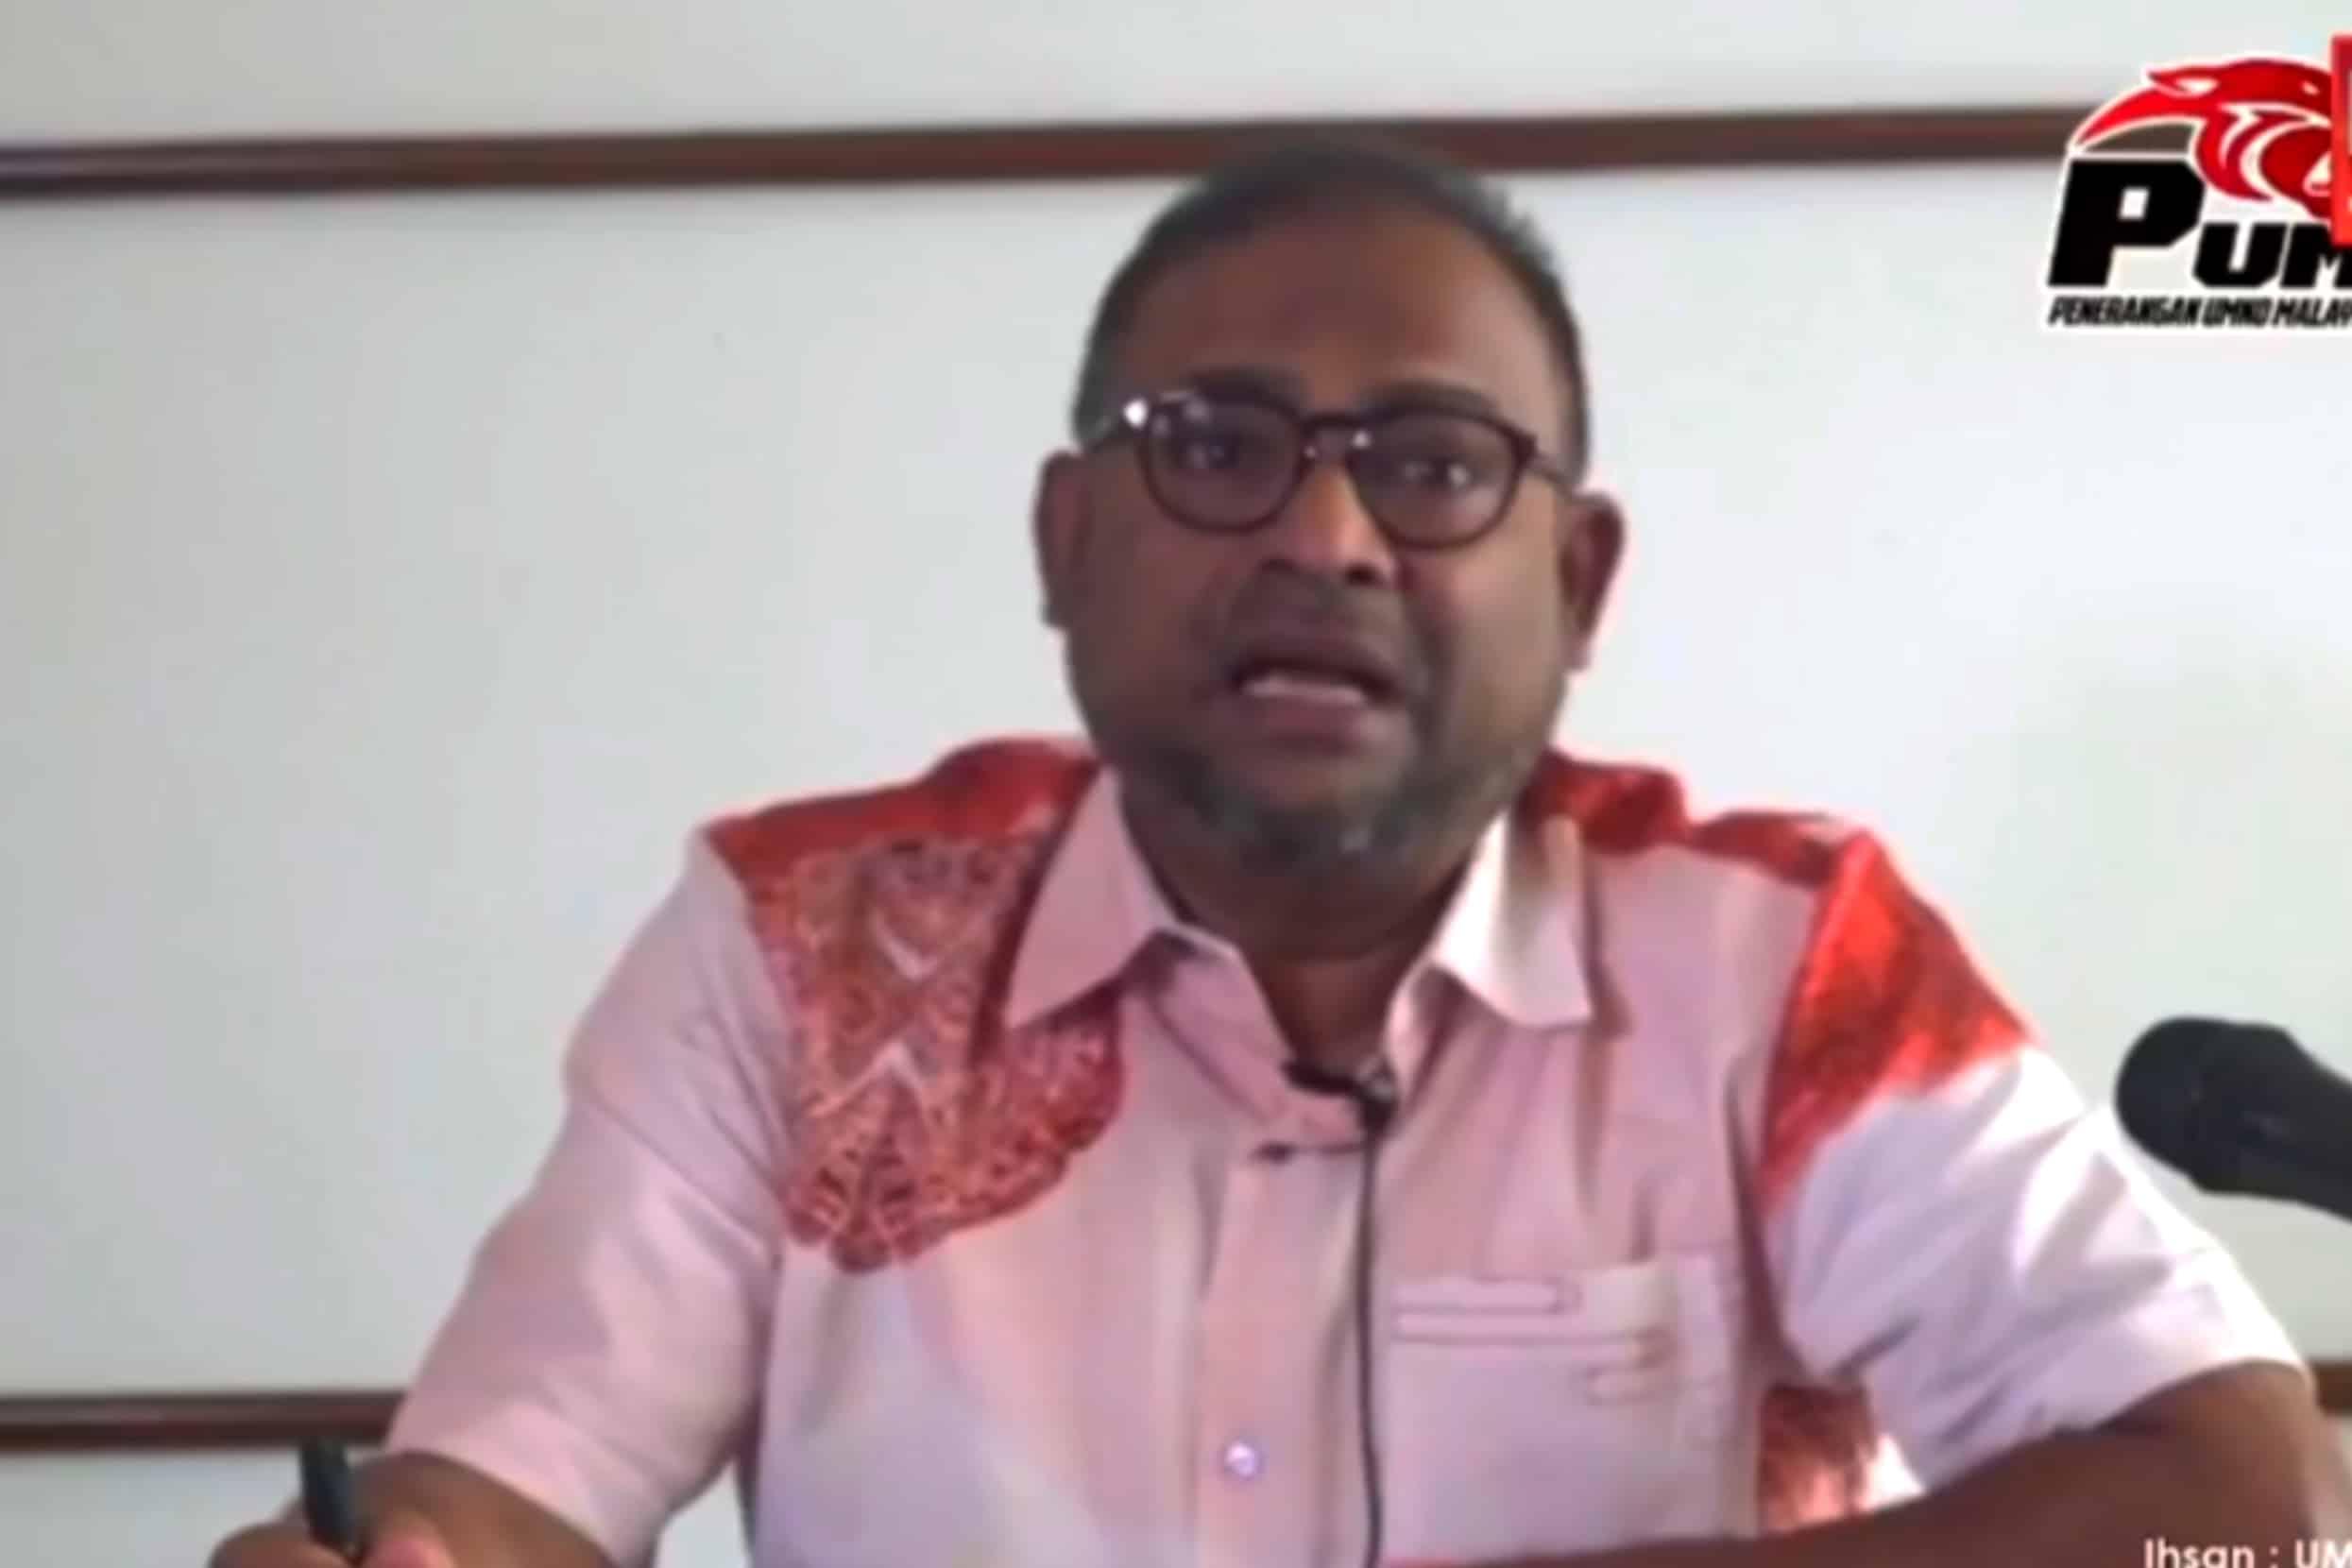 Sebagai ahli parti, bertanding atas nama UMNO dan Barisan Nasional tidak mungkin ianya benar – Azeez Rahim